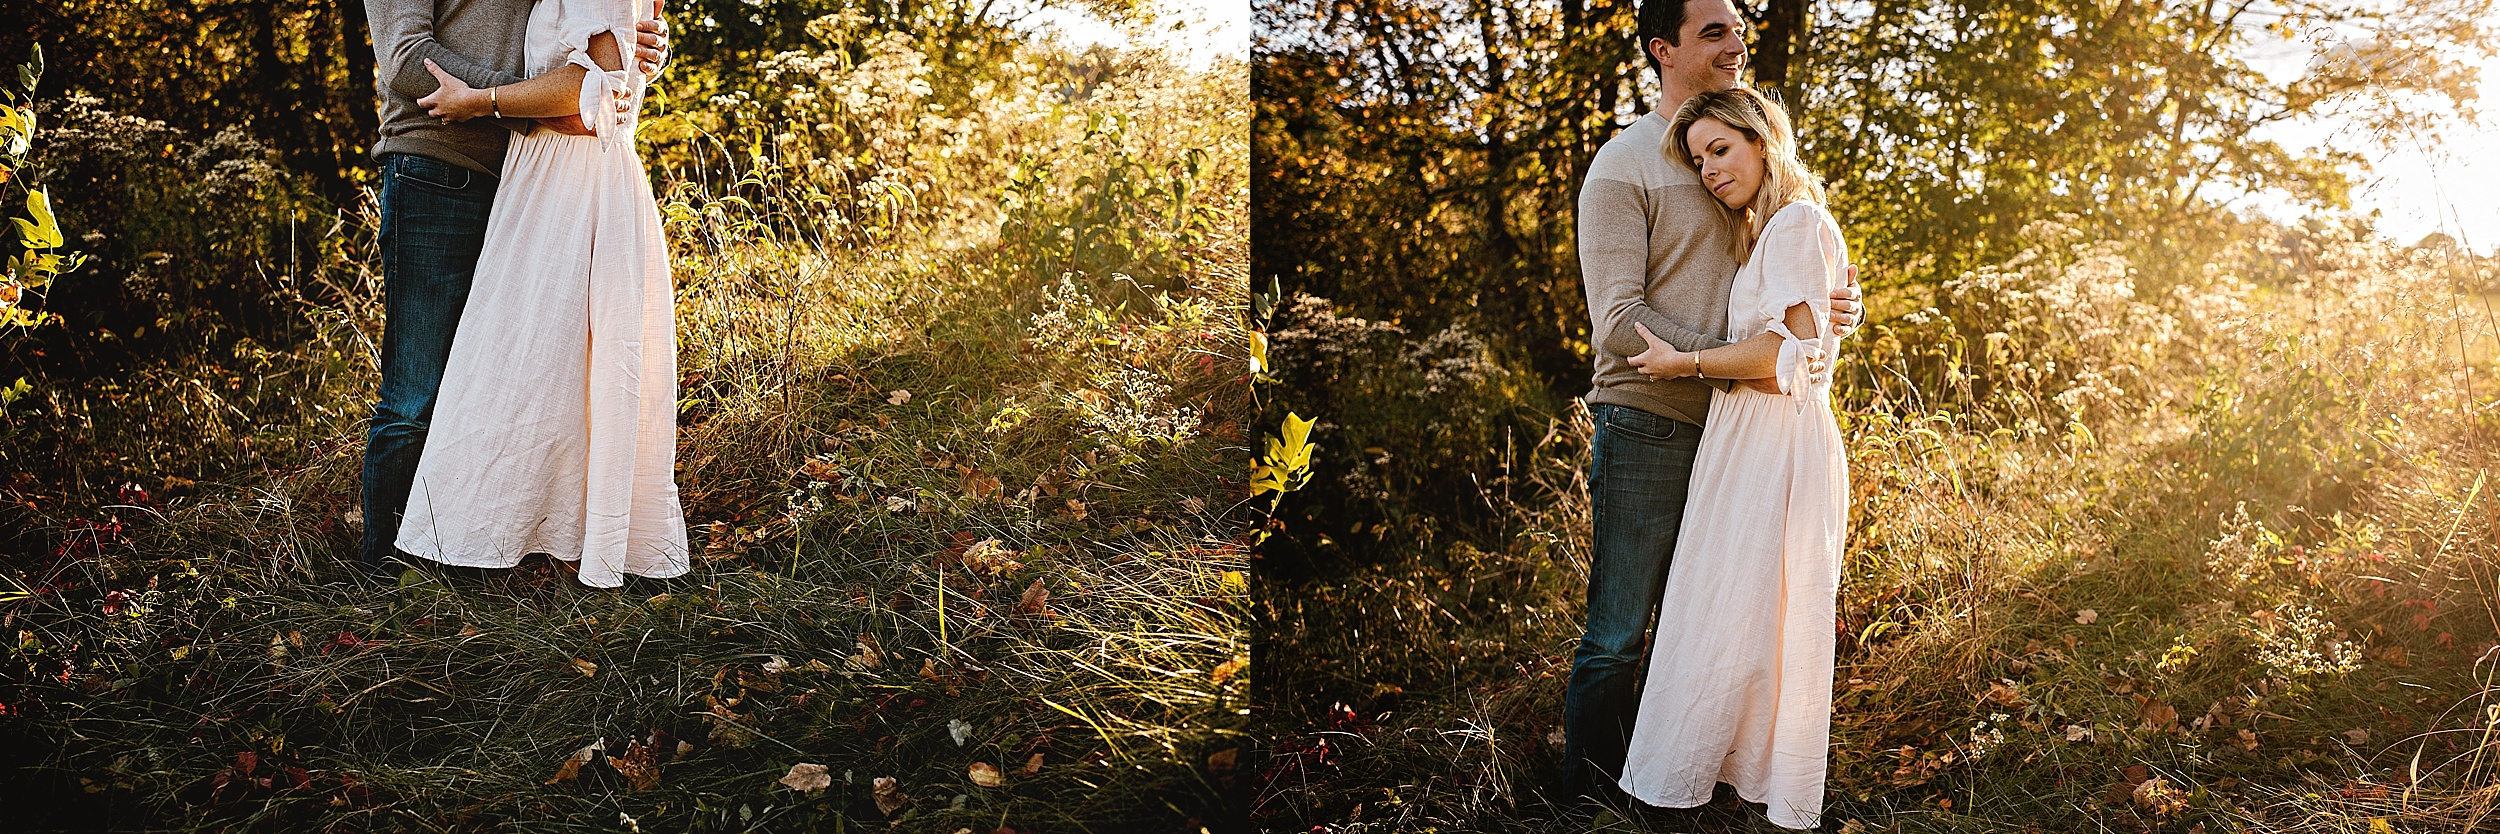 lauren-grayson-photography-portrait-artist-akron-cleveland-ohio-photographer-family-session-fields-sunset-fall_0179.jpg